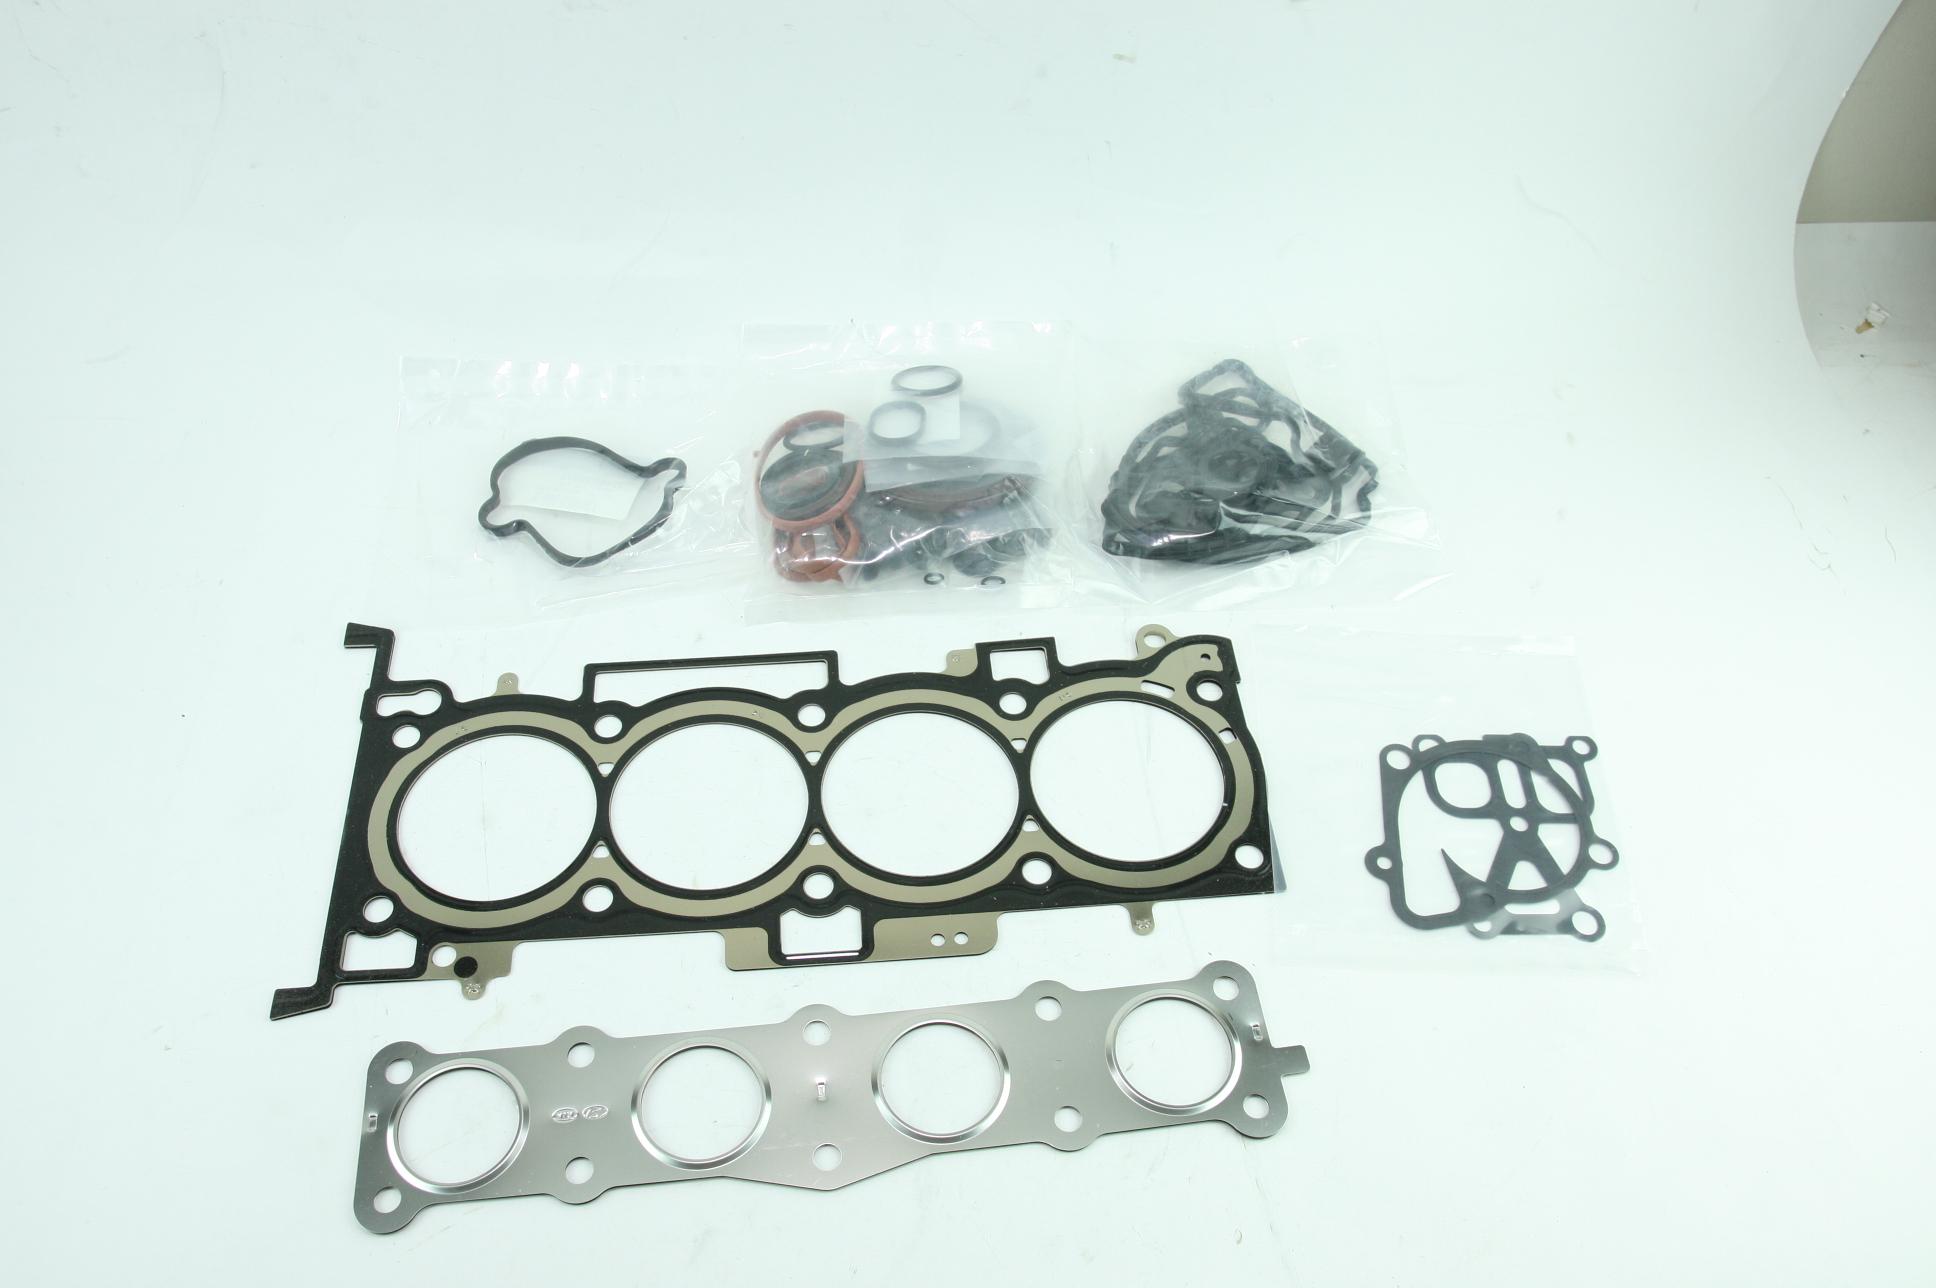 ** New Genuine Hyundai 209102GK03 Full Engine Overhaul Gasket Set Free Shipping - image 1